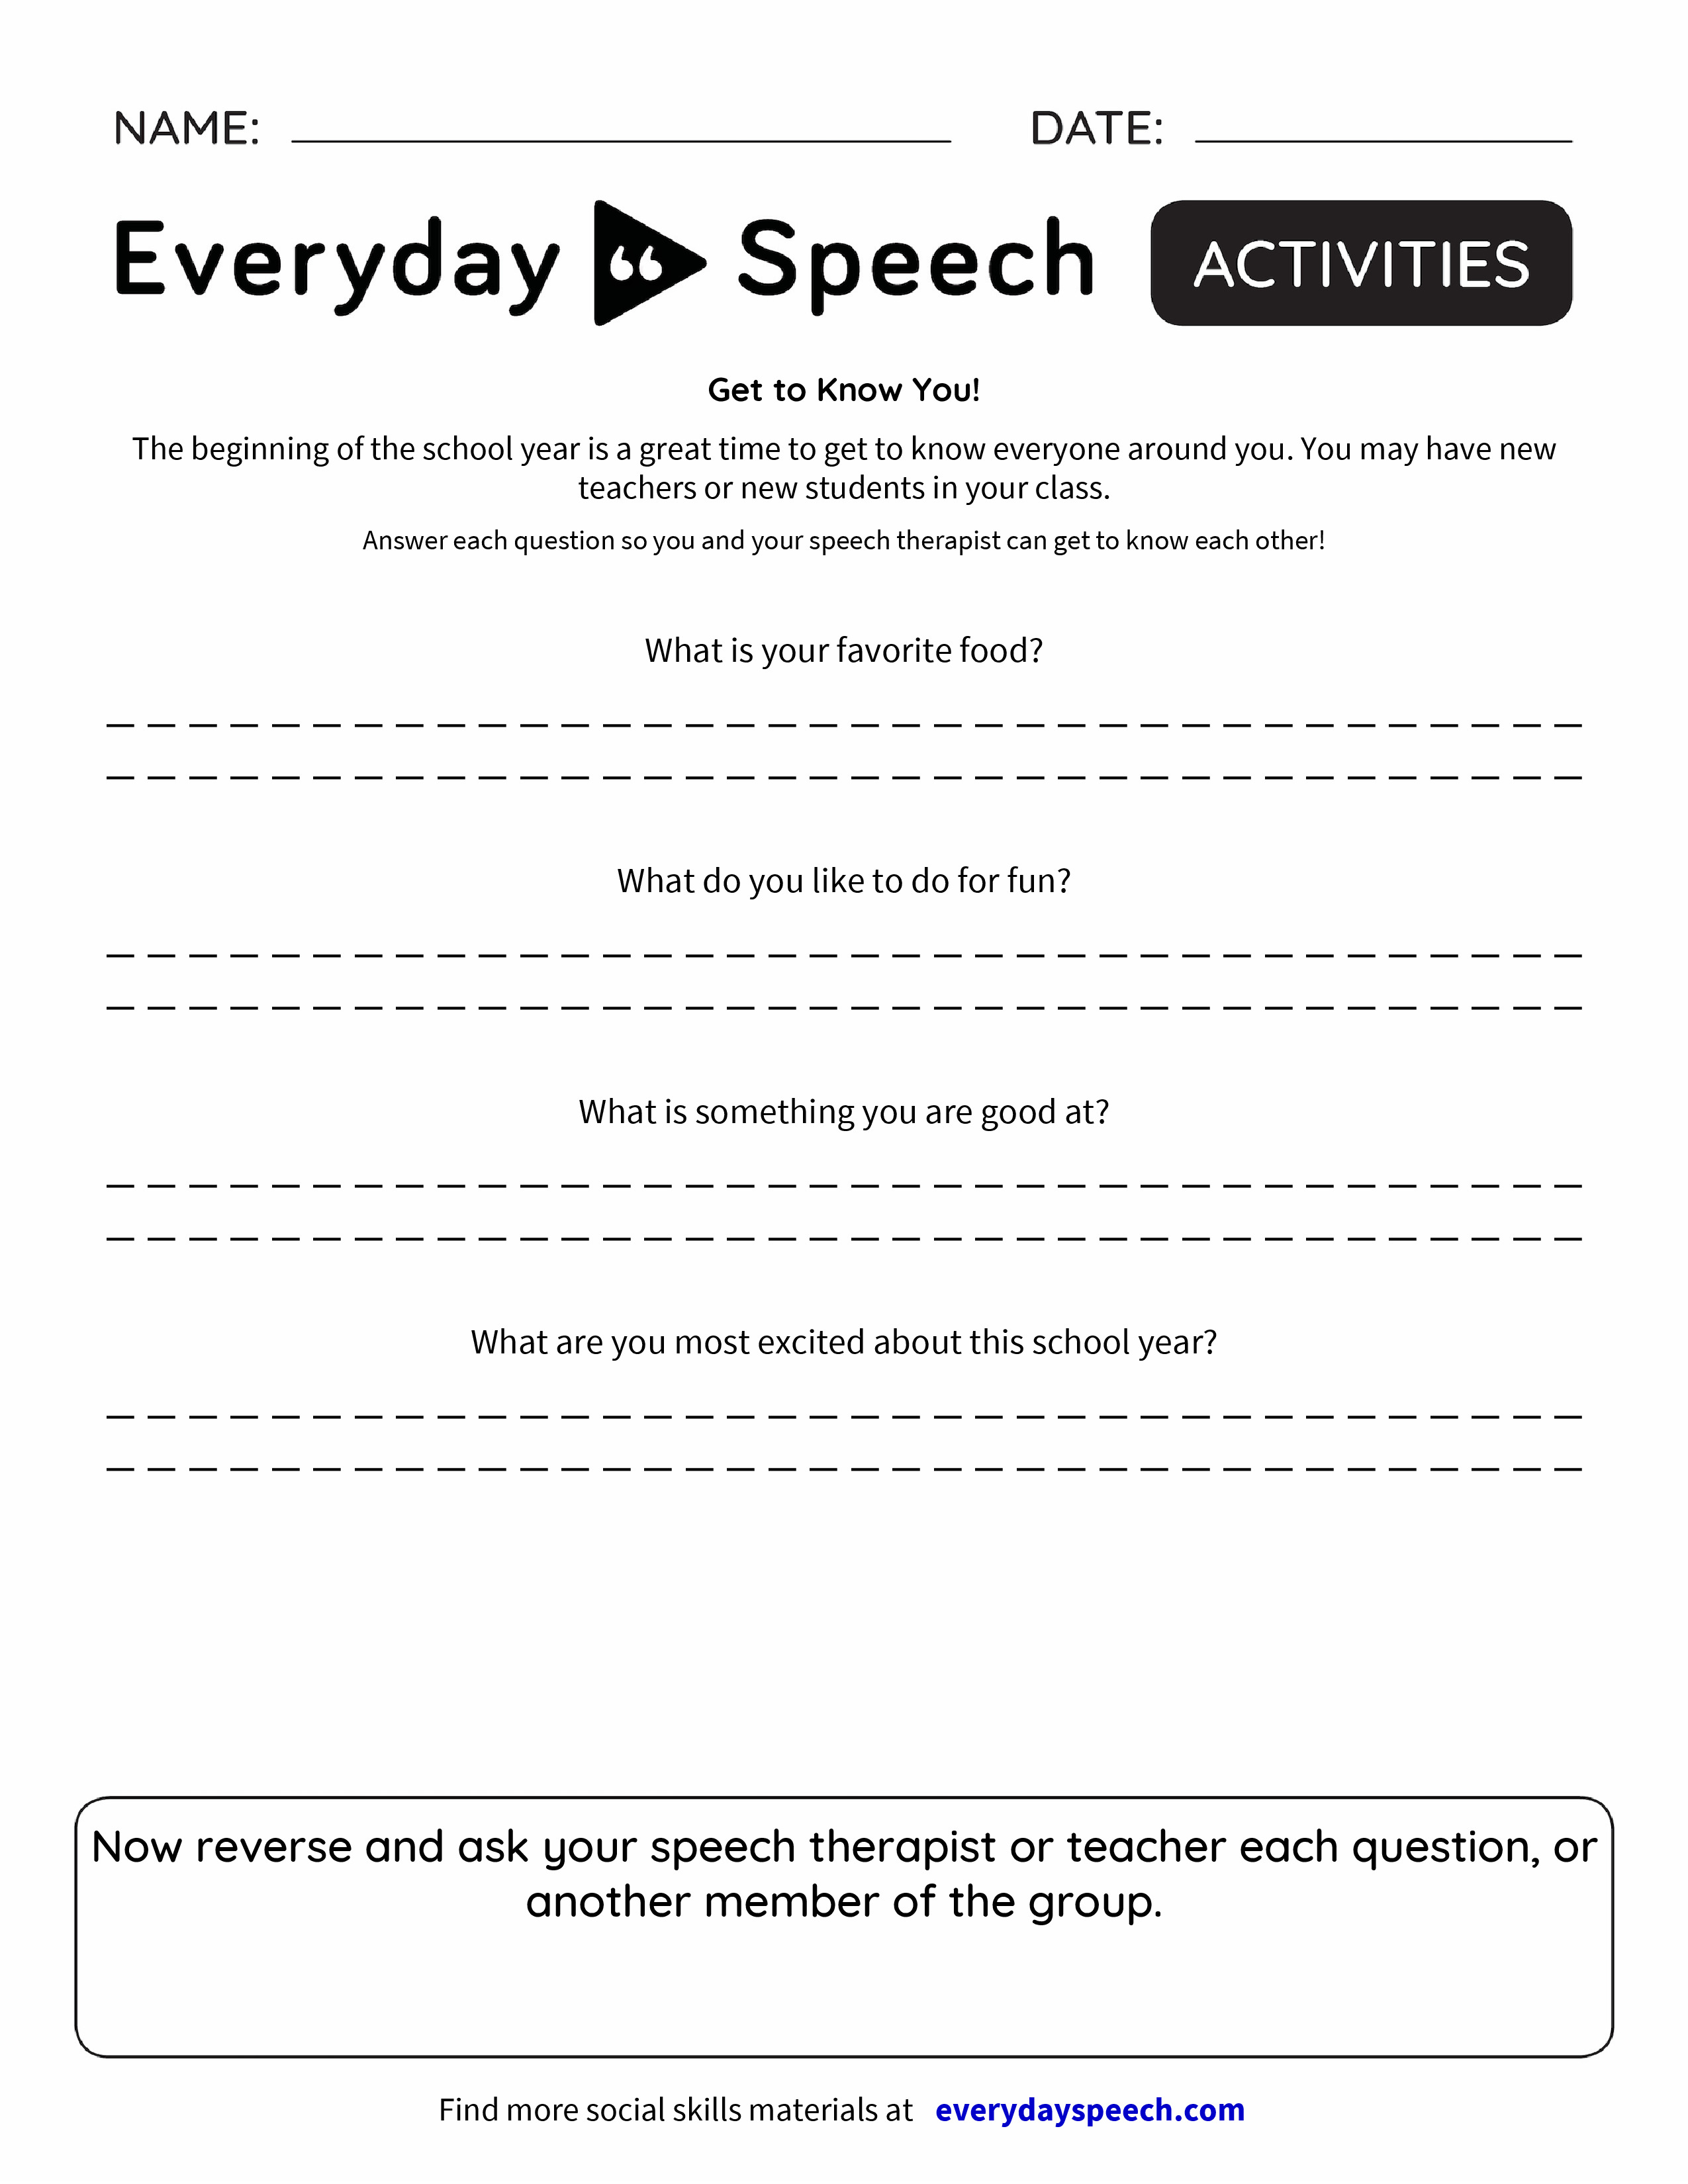 Get To Know You Everyday Speech Everyday Speech